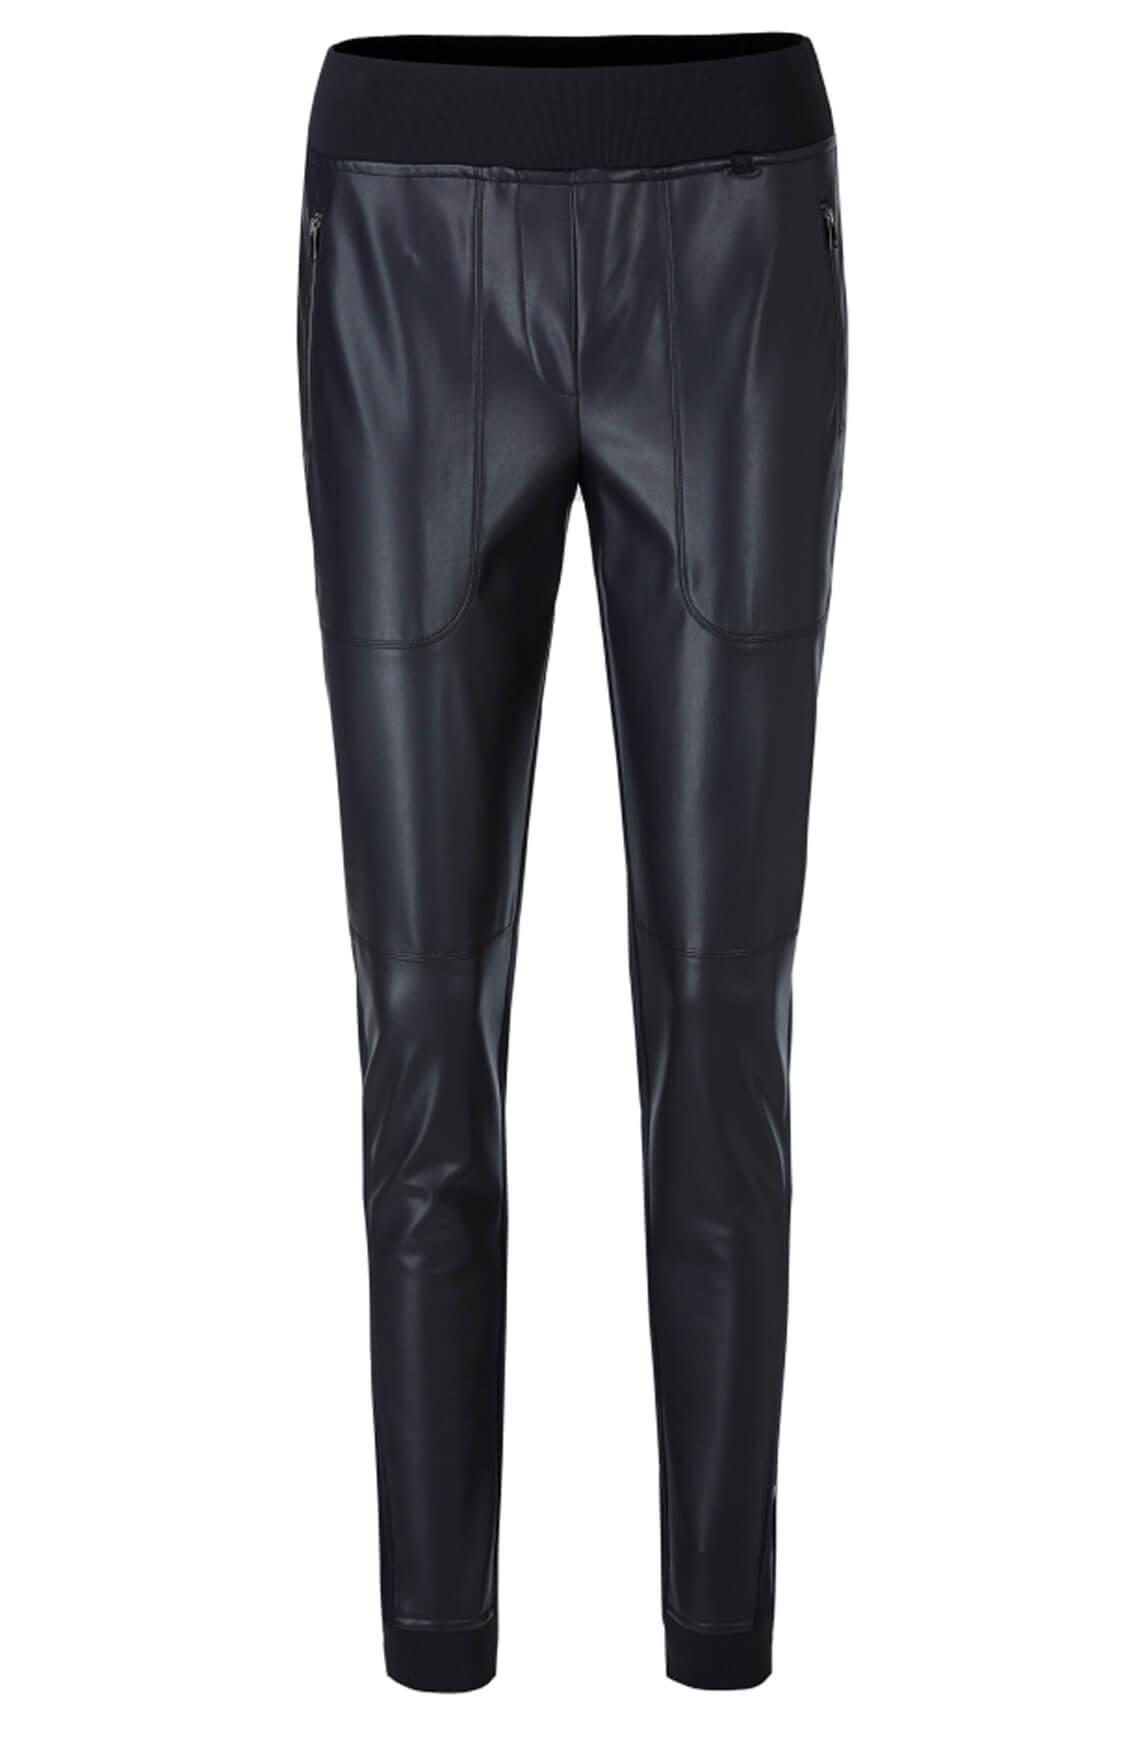 Marccain Sports Dames Pantalon van materiaalmix Blauw